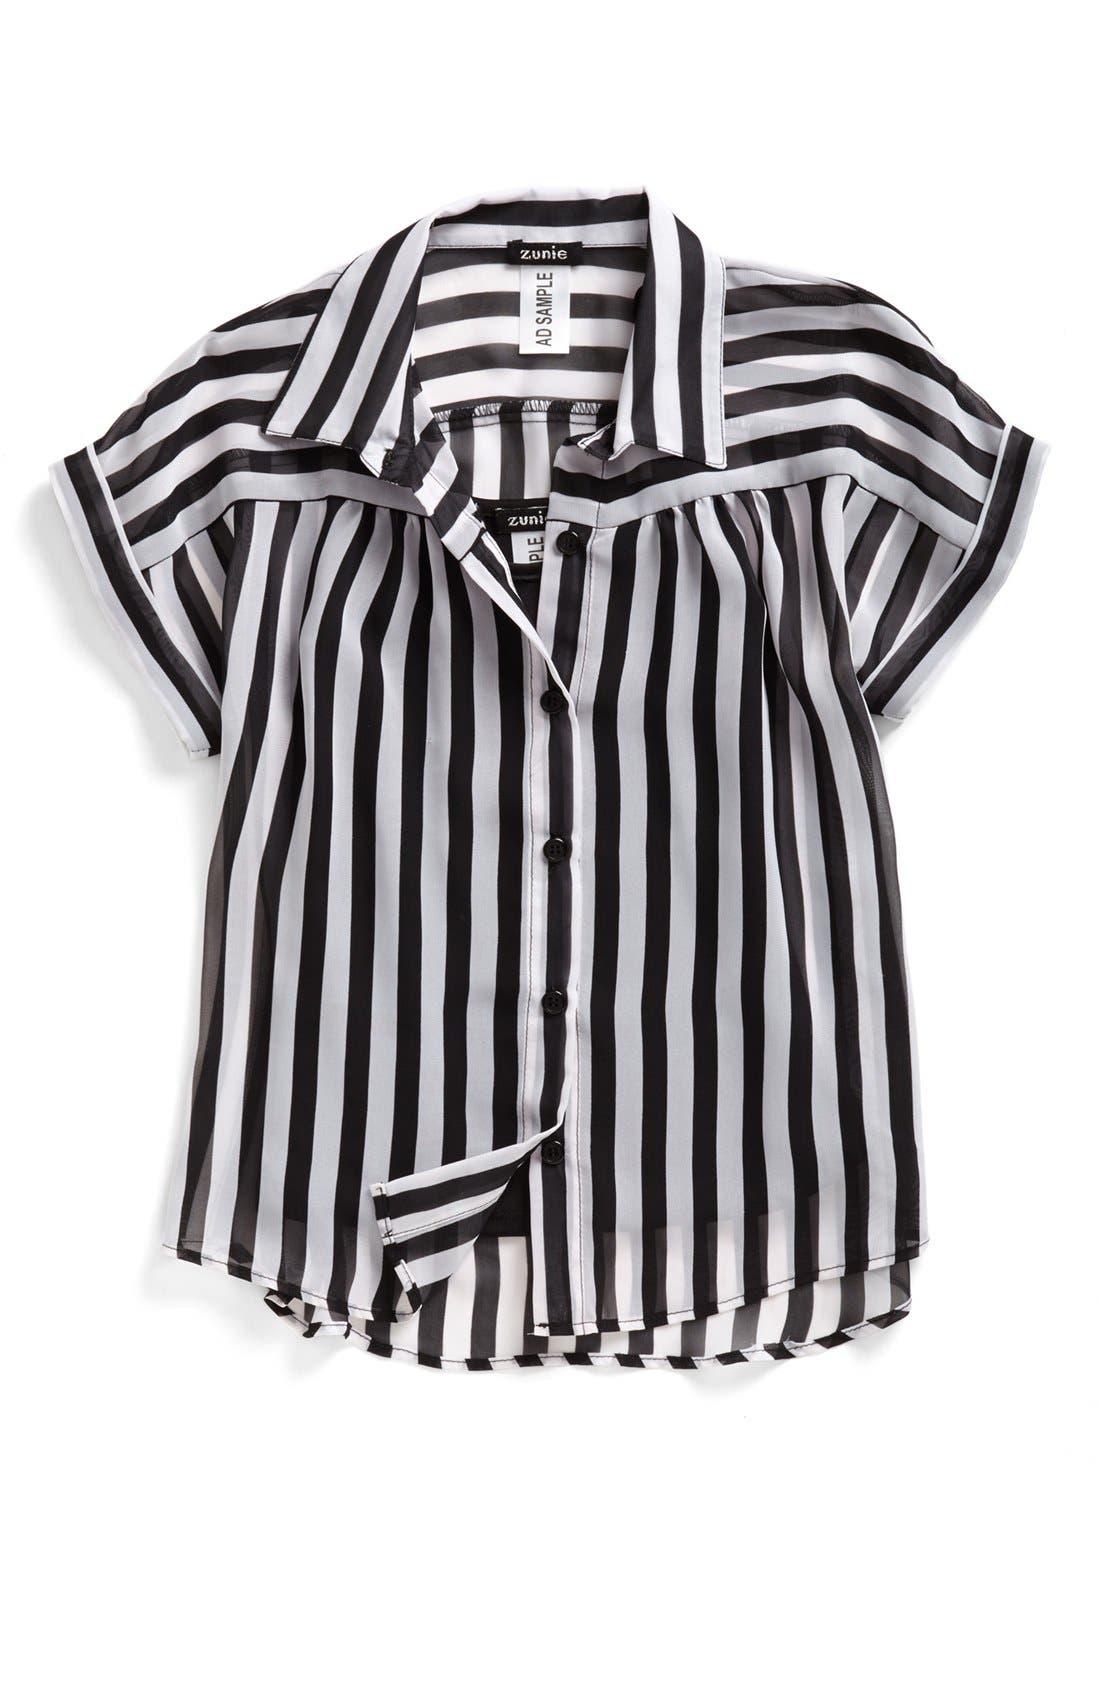 Alternate Image 1 Selected - Zunie Stripe Top (Big Girls)